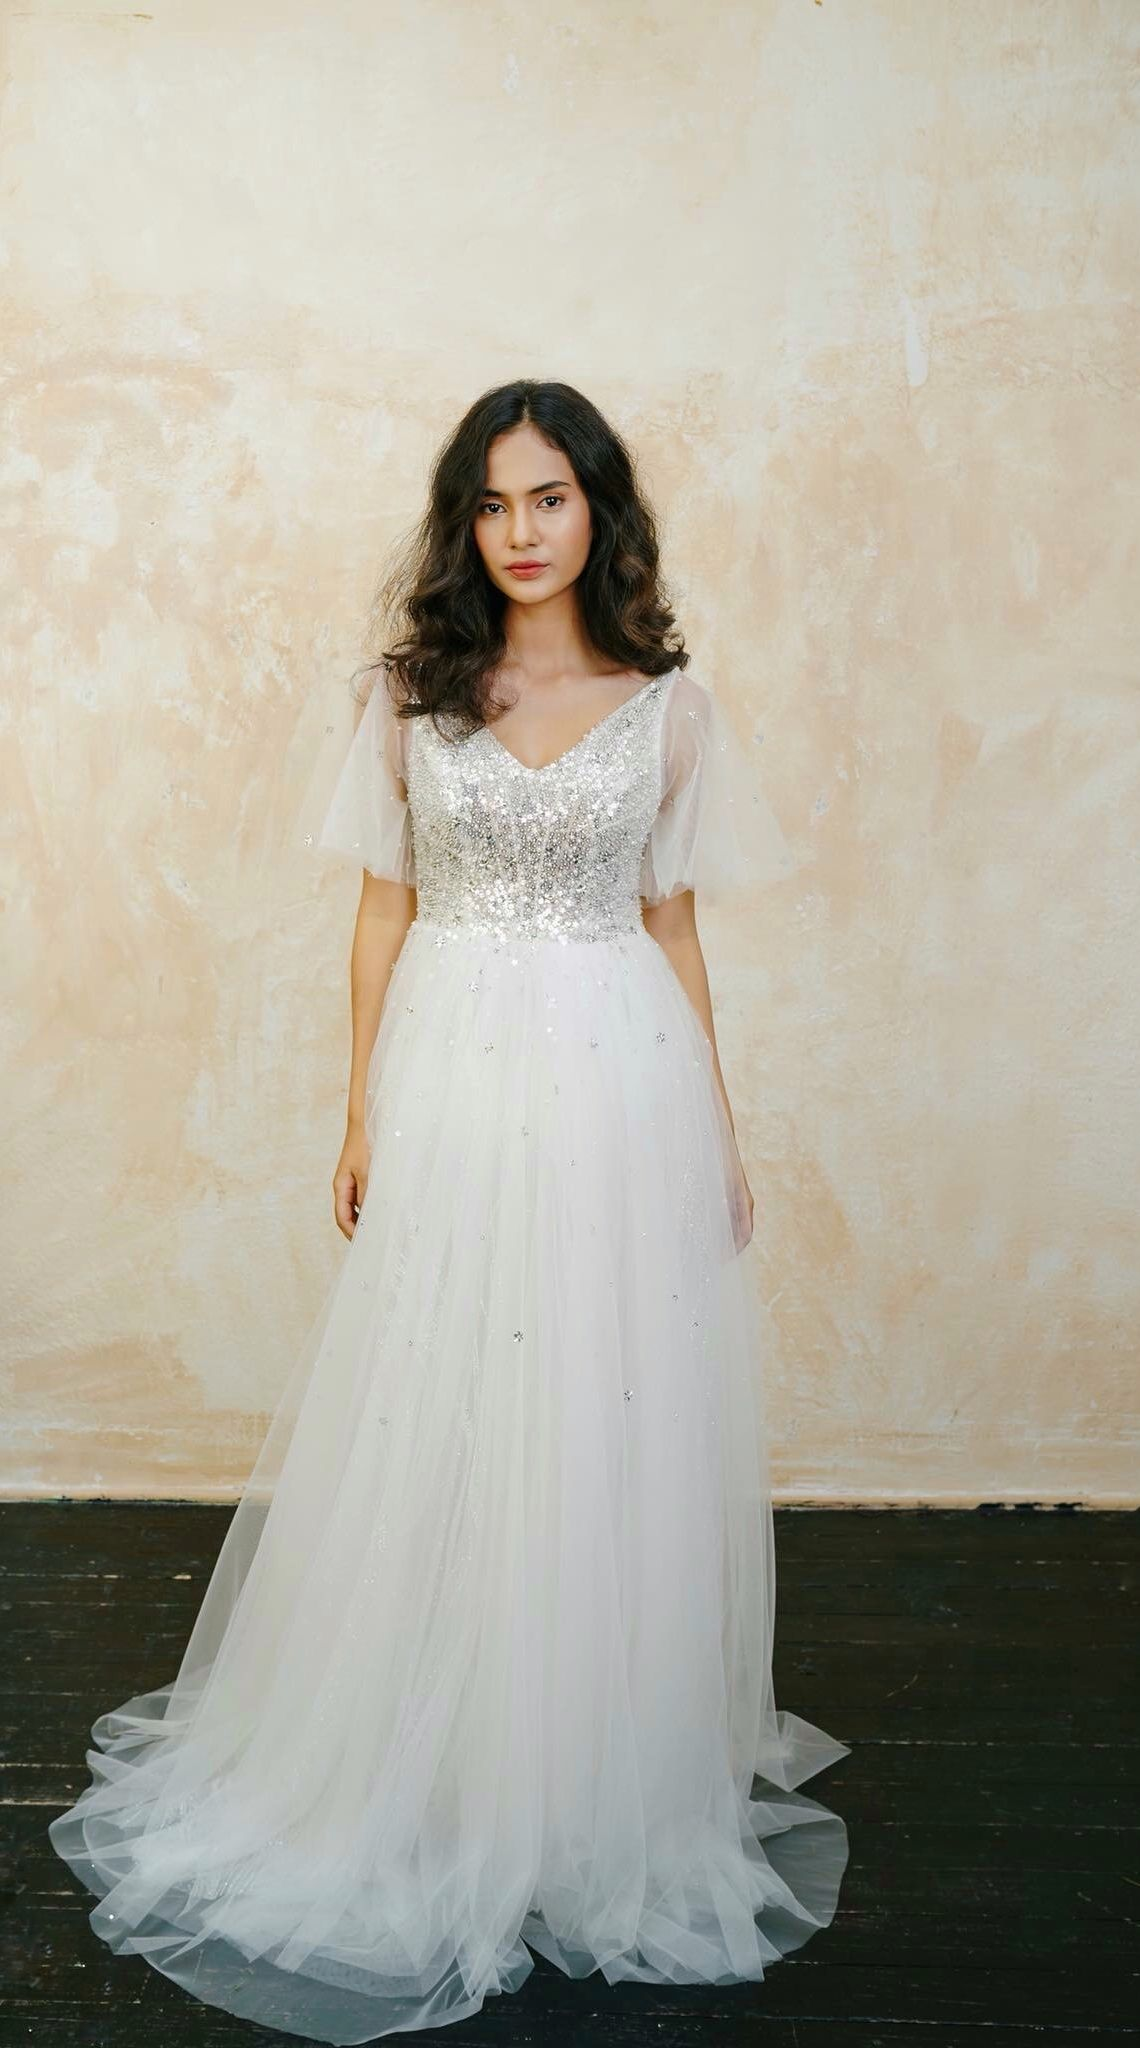 Aline Wedding Dress Flutter Sleeves Bridal Gown Sparkly